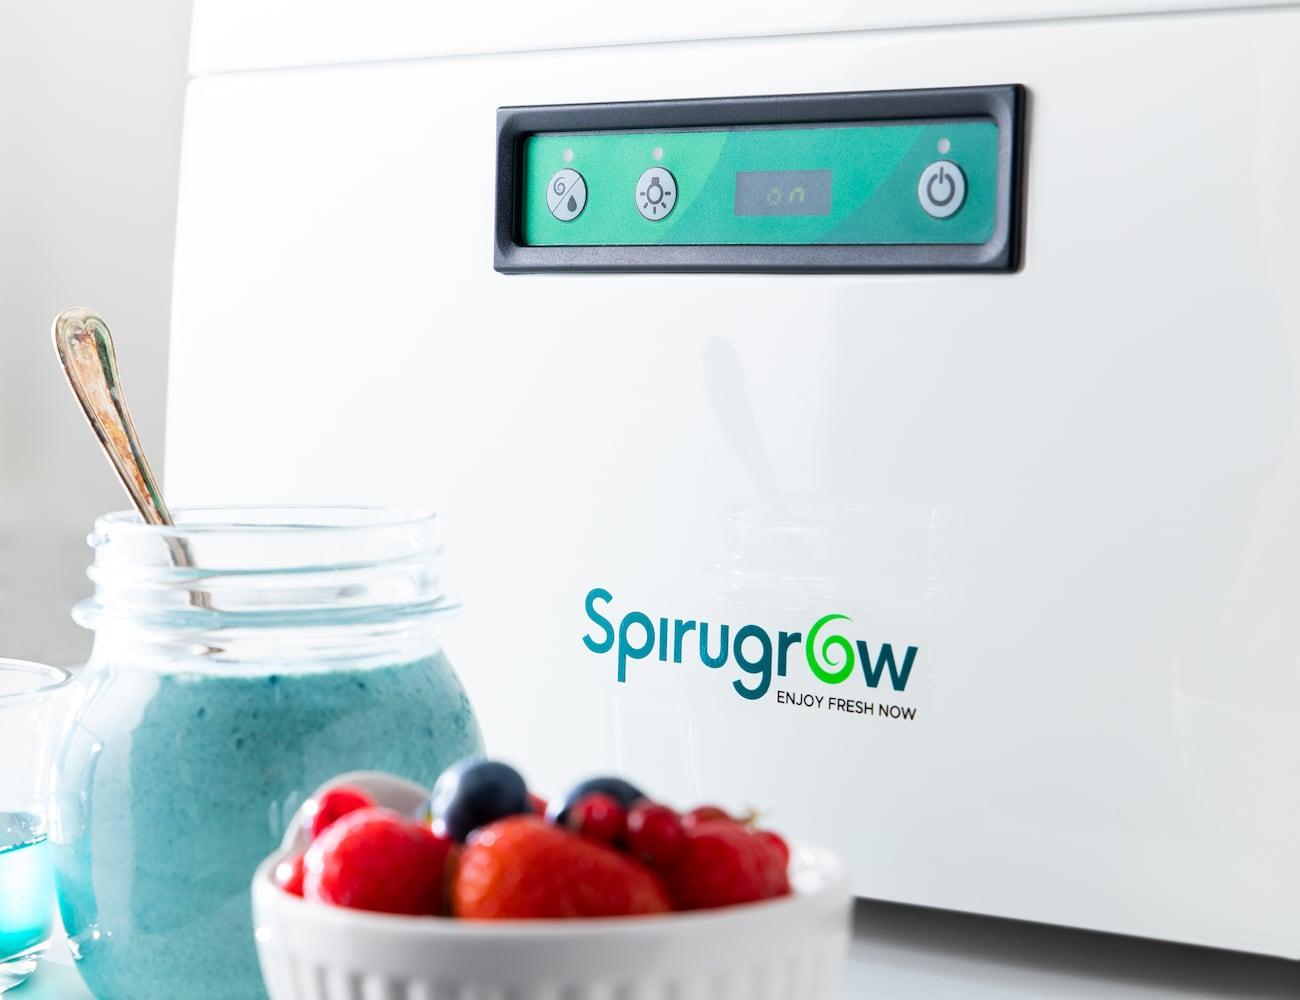 Spirugrow Automatic Indoor Spirulina Growing System